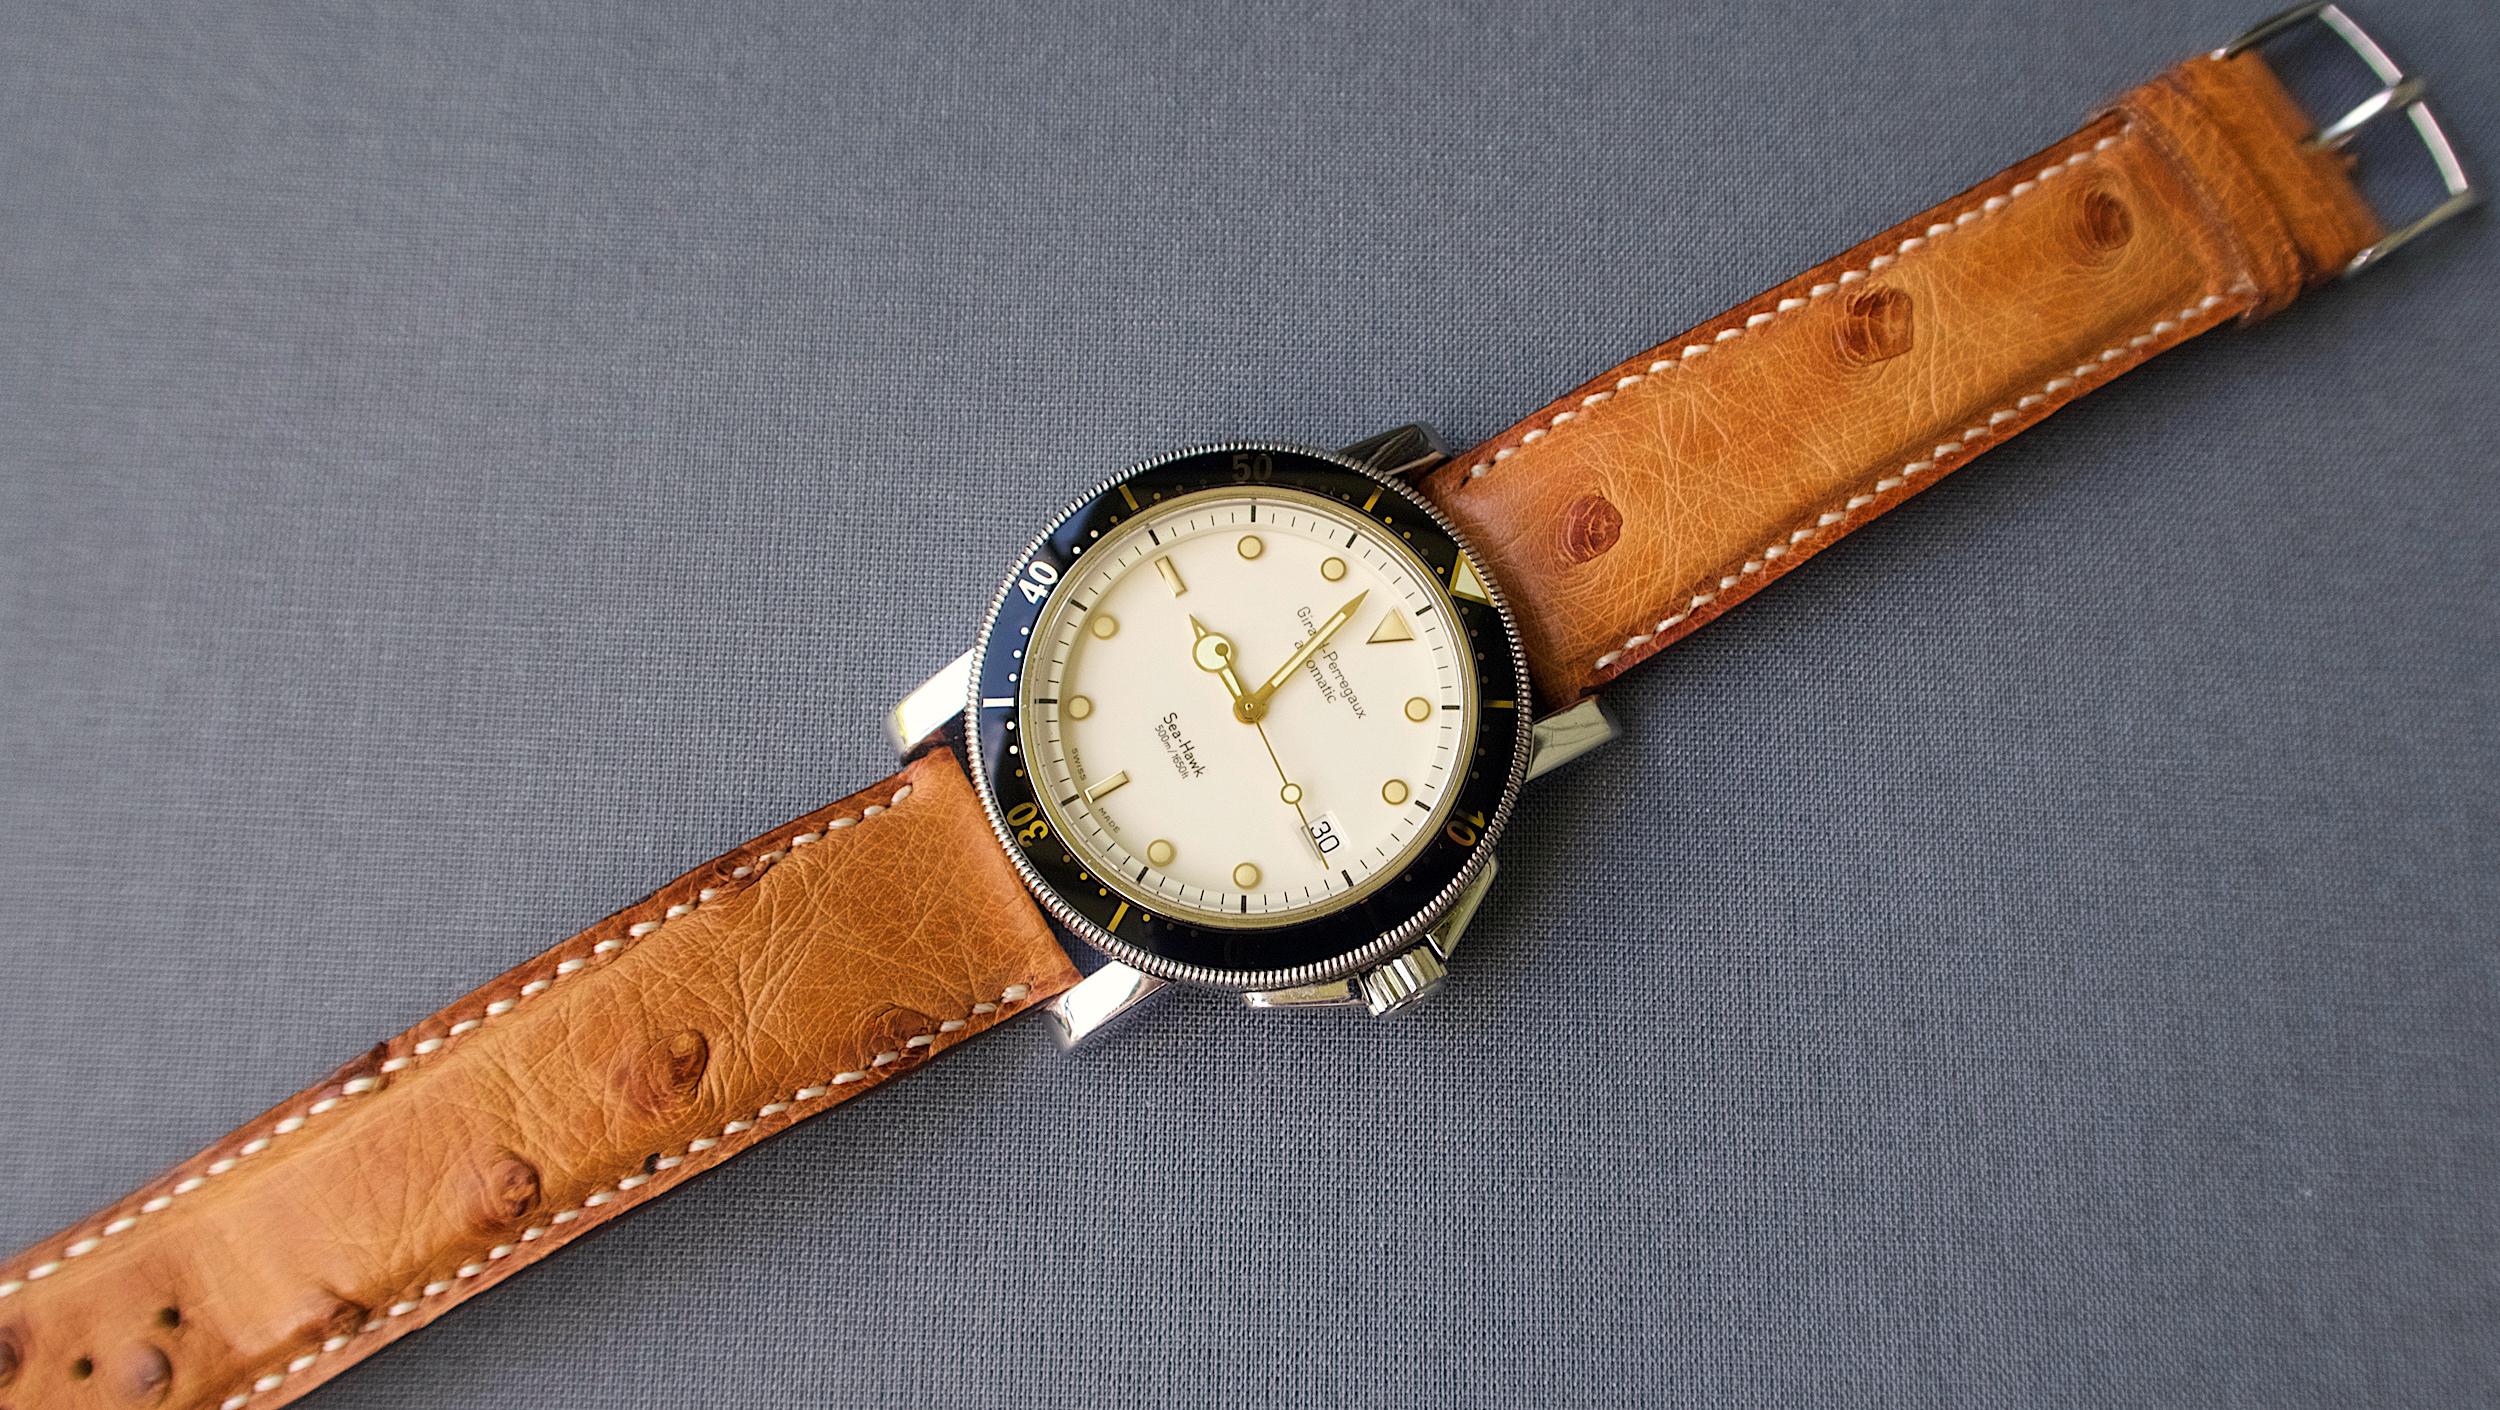 quick/peek: Girard-Perregaux Sea Hawk 7100